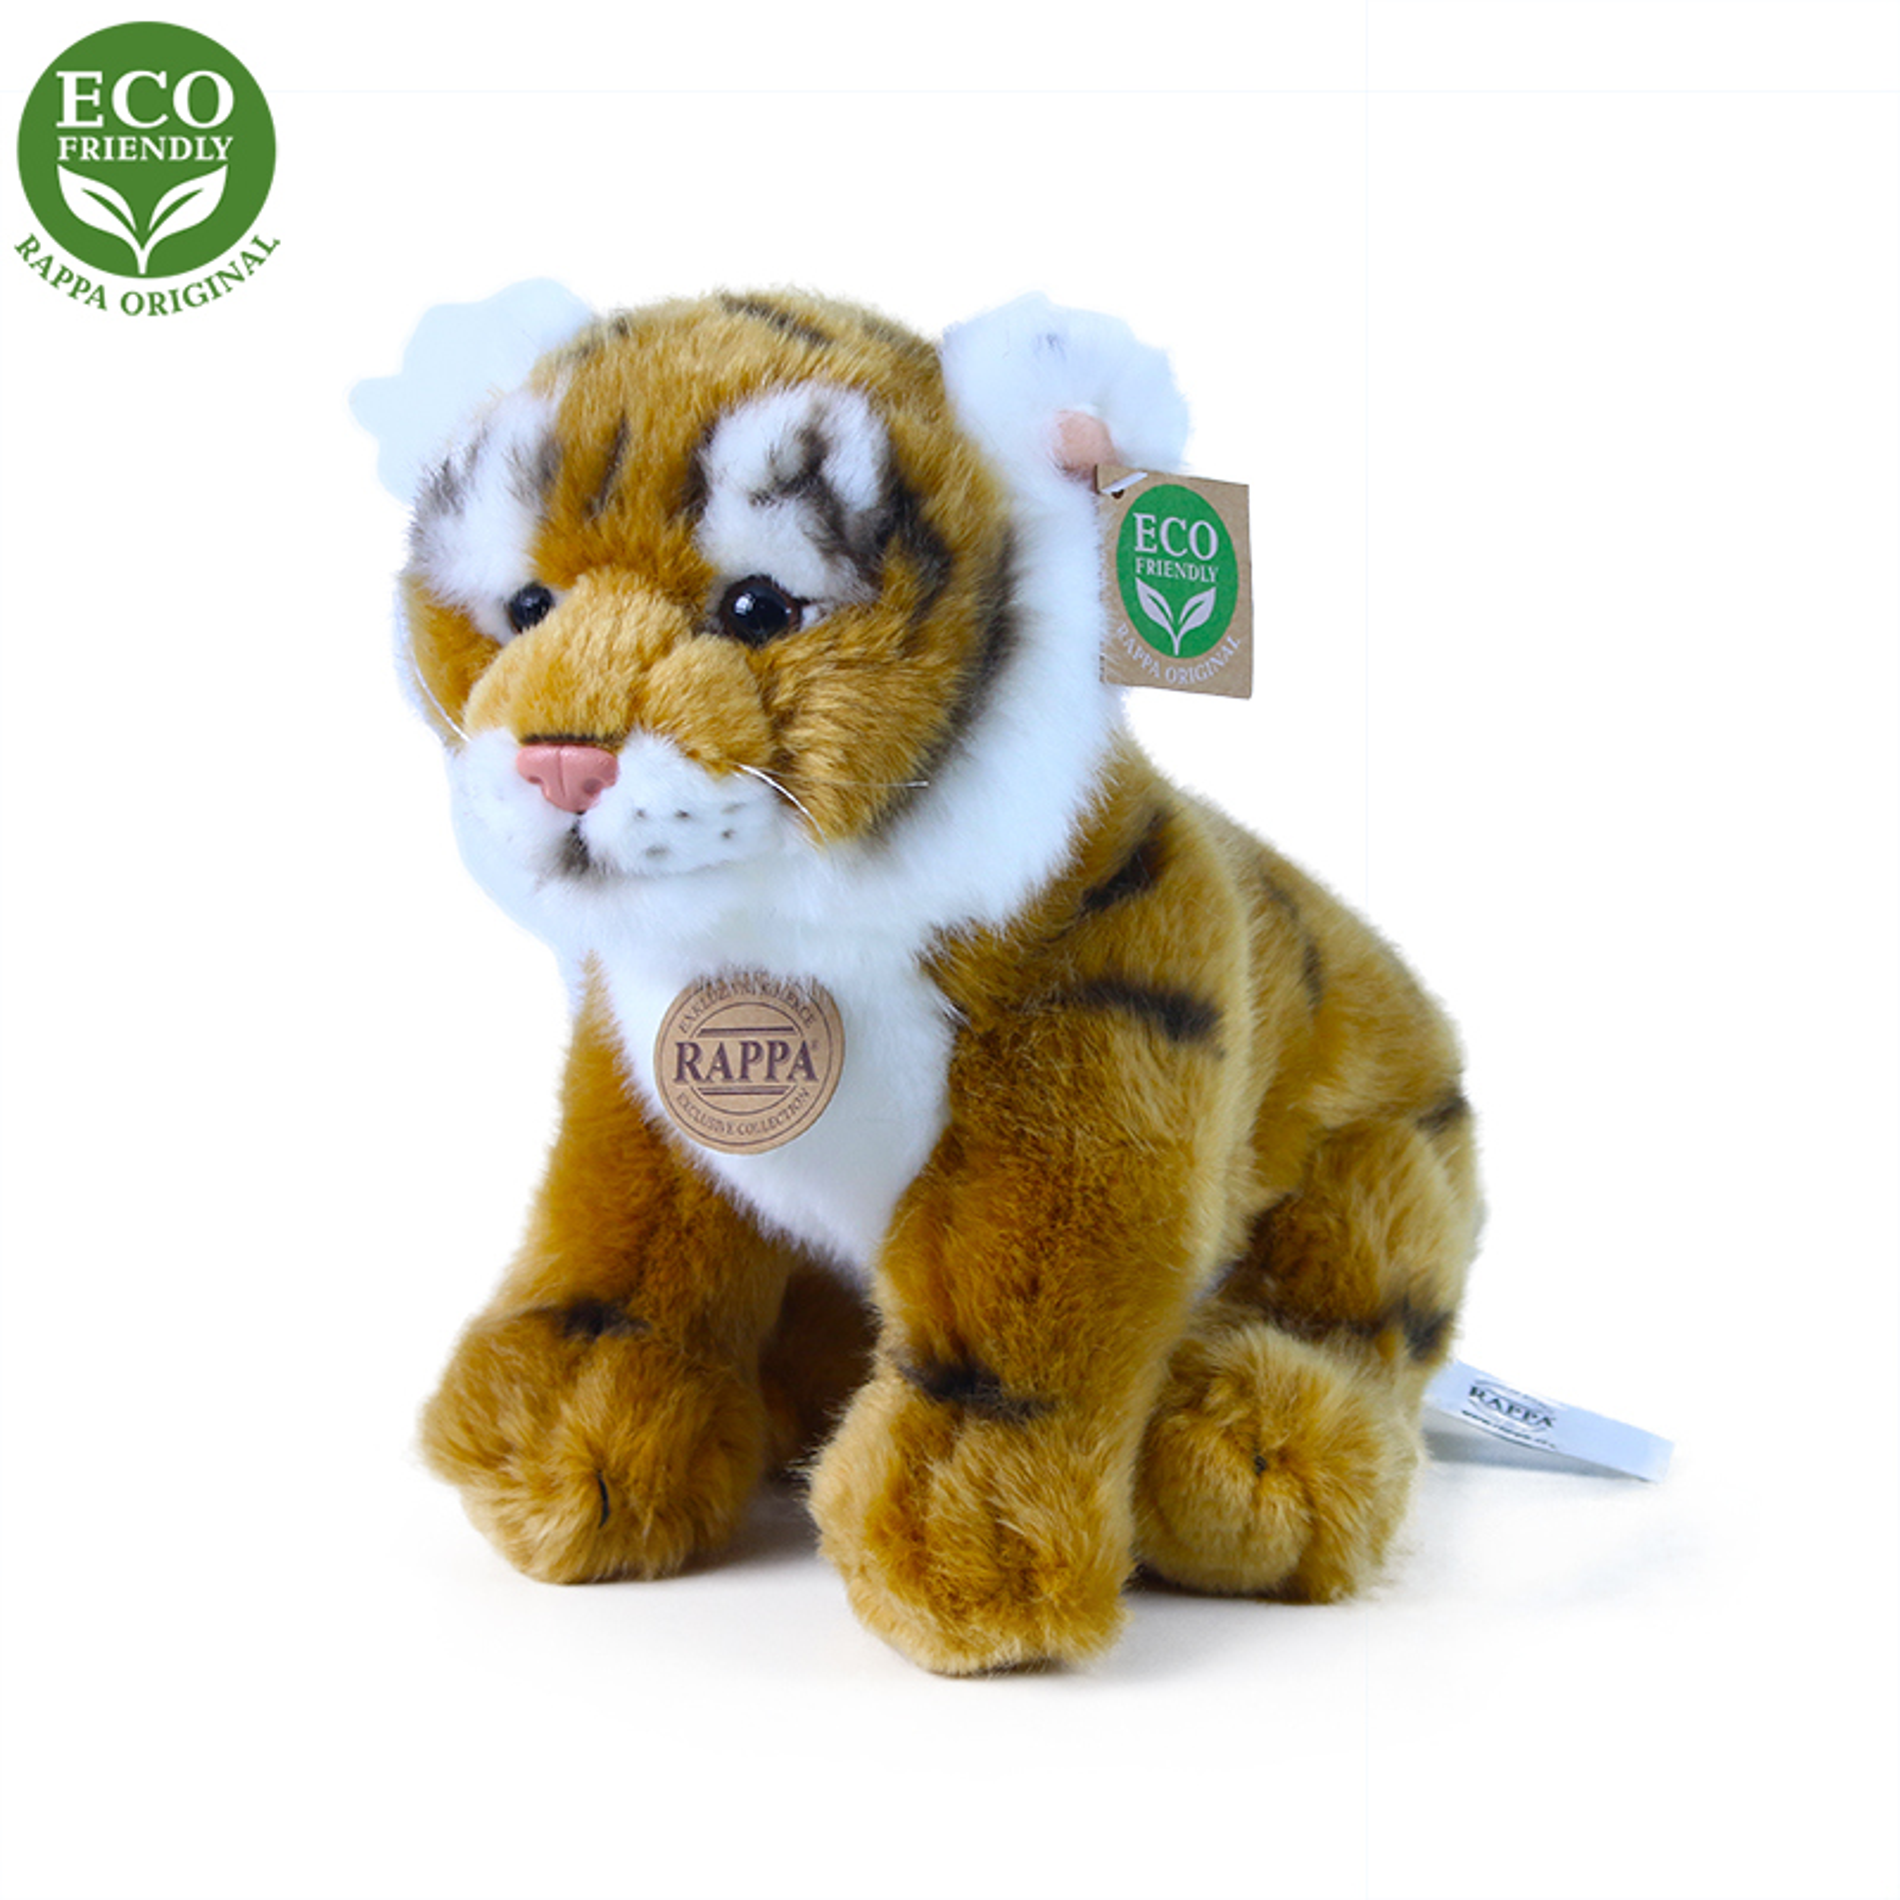 Plyšový tygr hnědý sedící 25 cm ECO-FRIENDLY